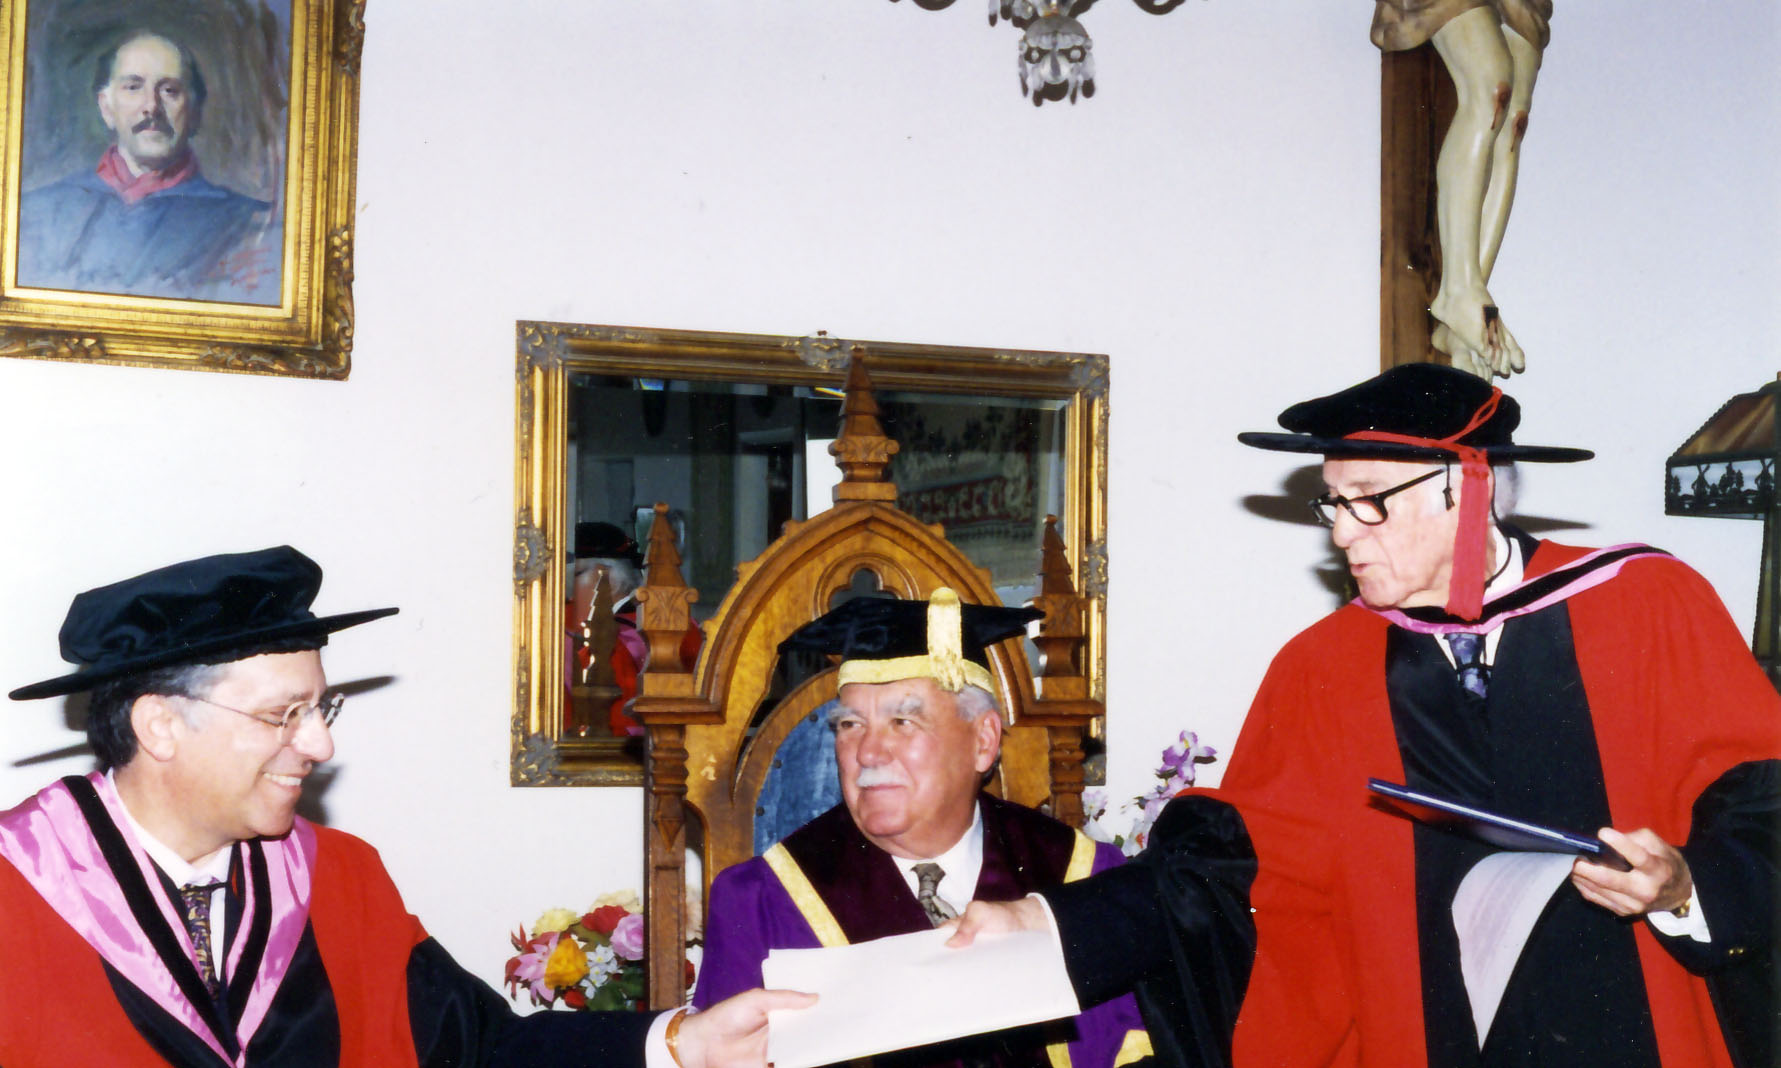 Celedonio receives Honorary Doctorate 1995